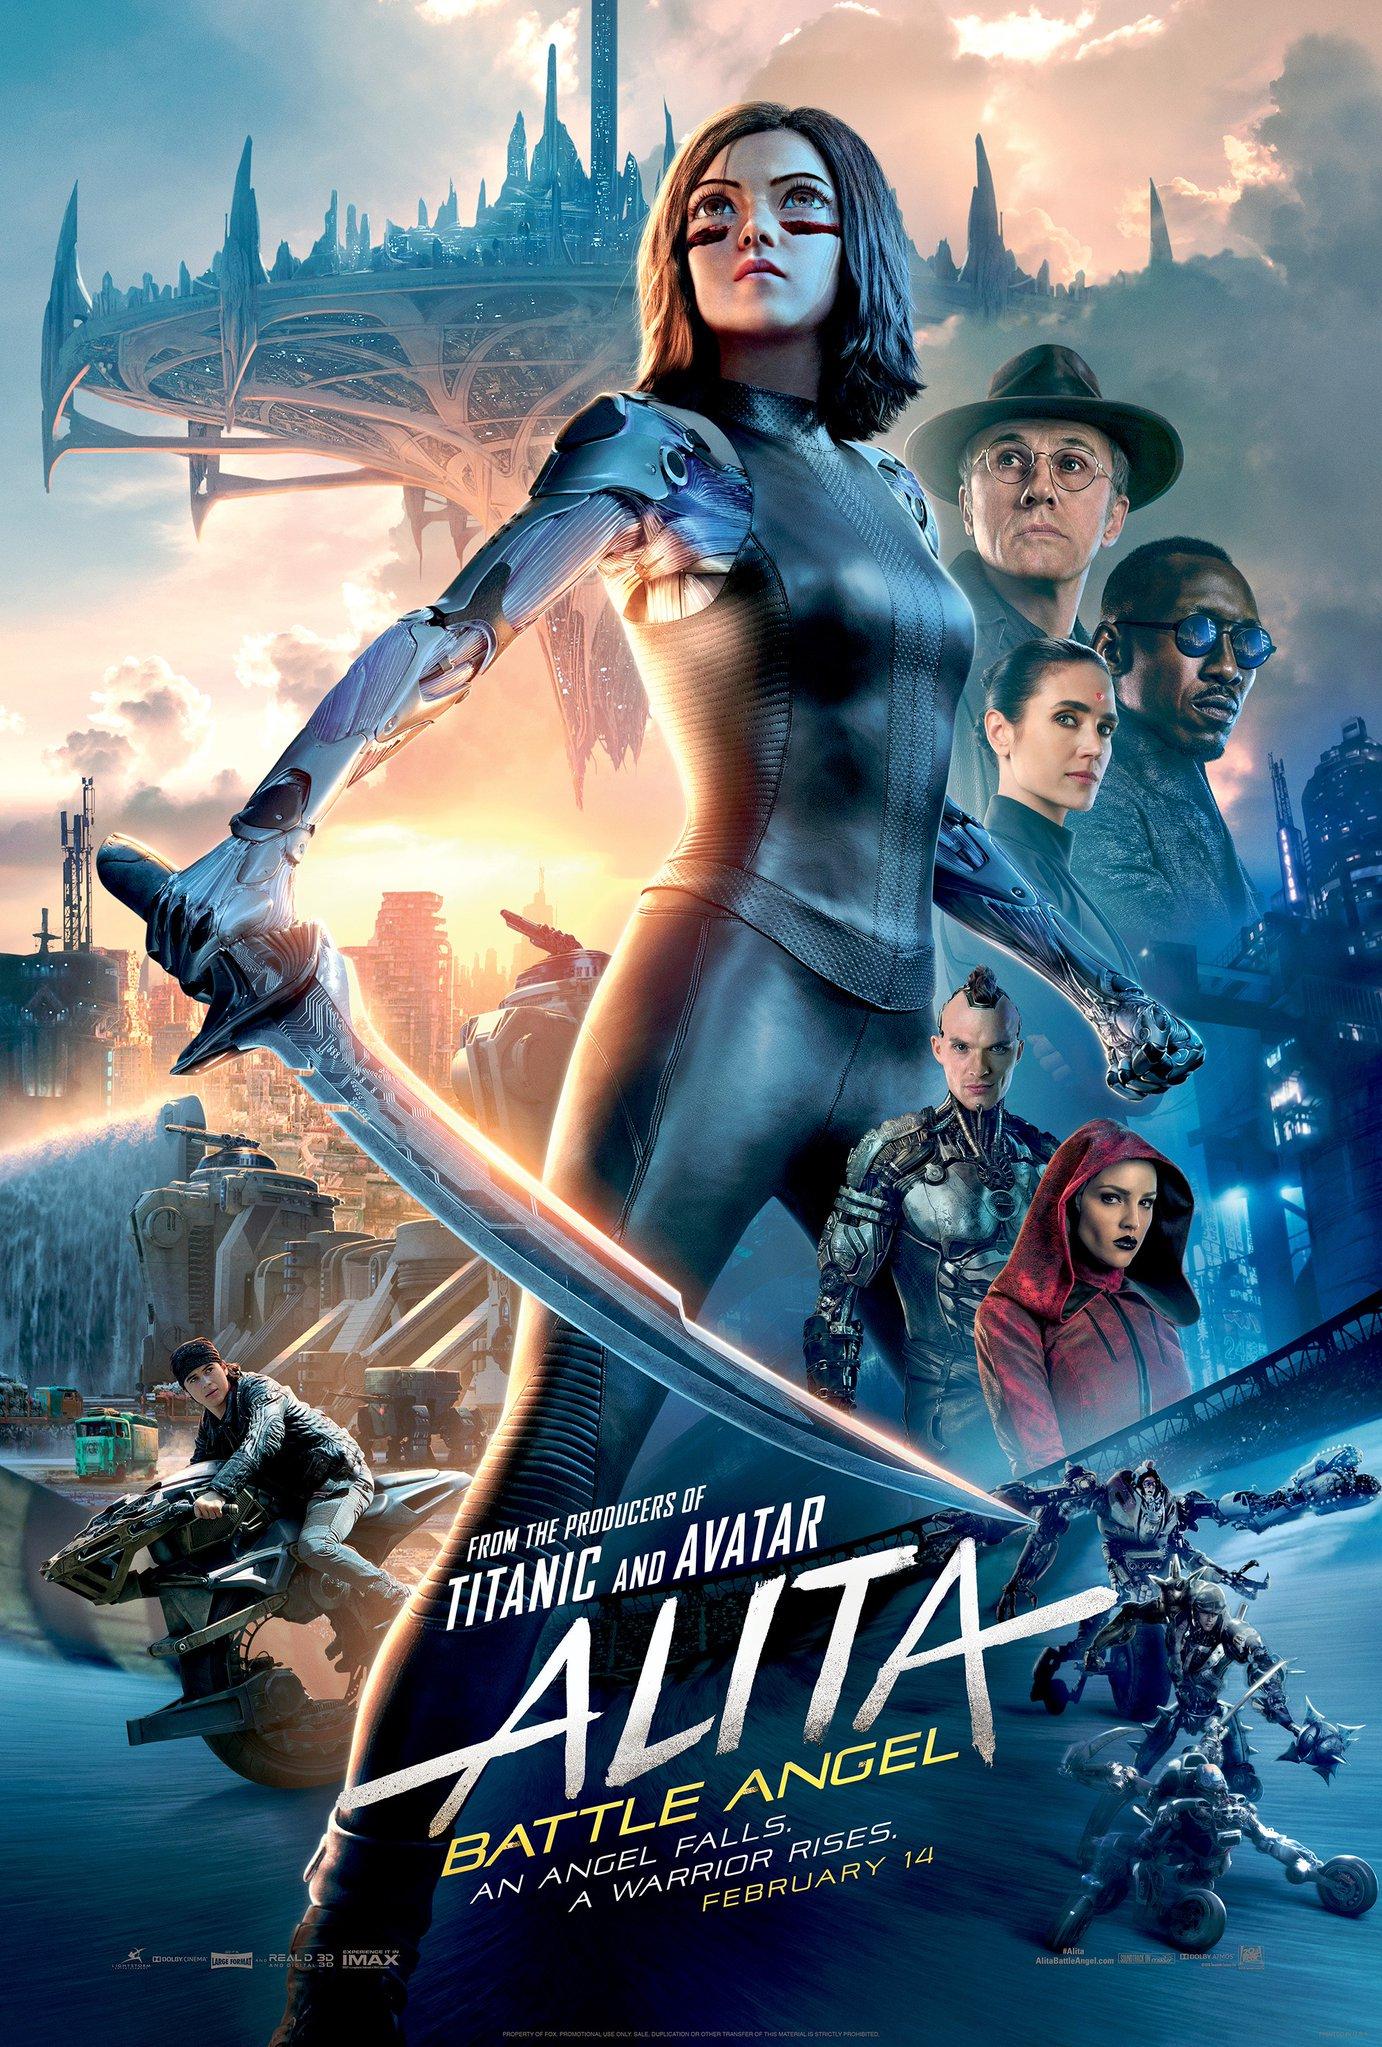 Alita: Battle malaikat Posters